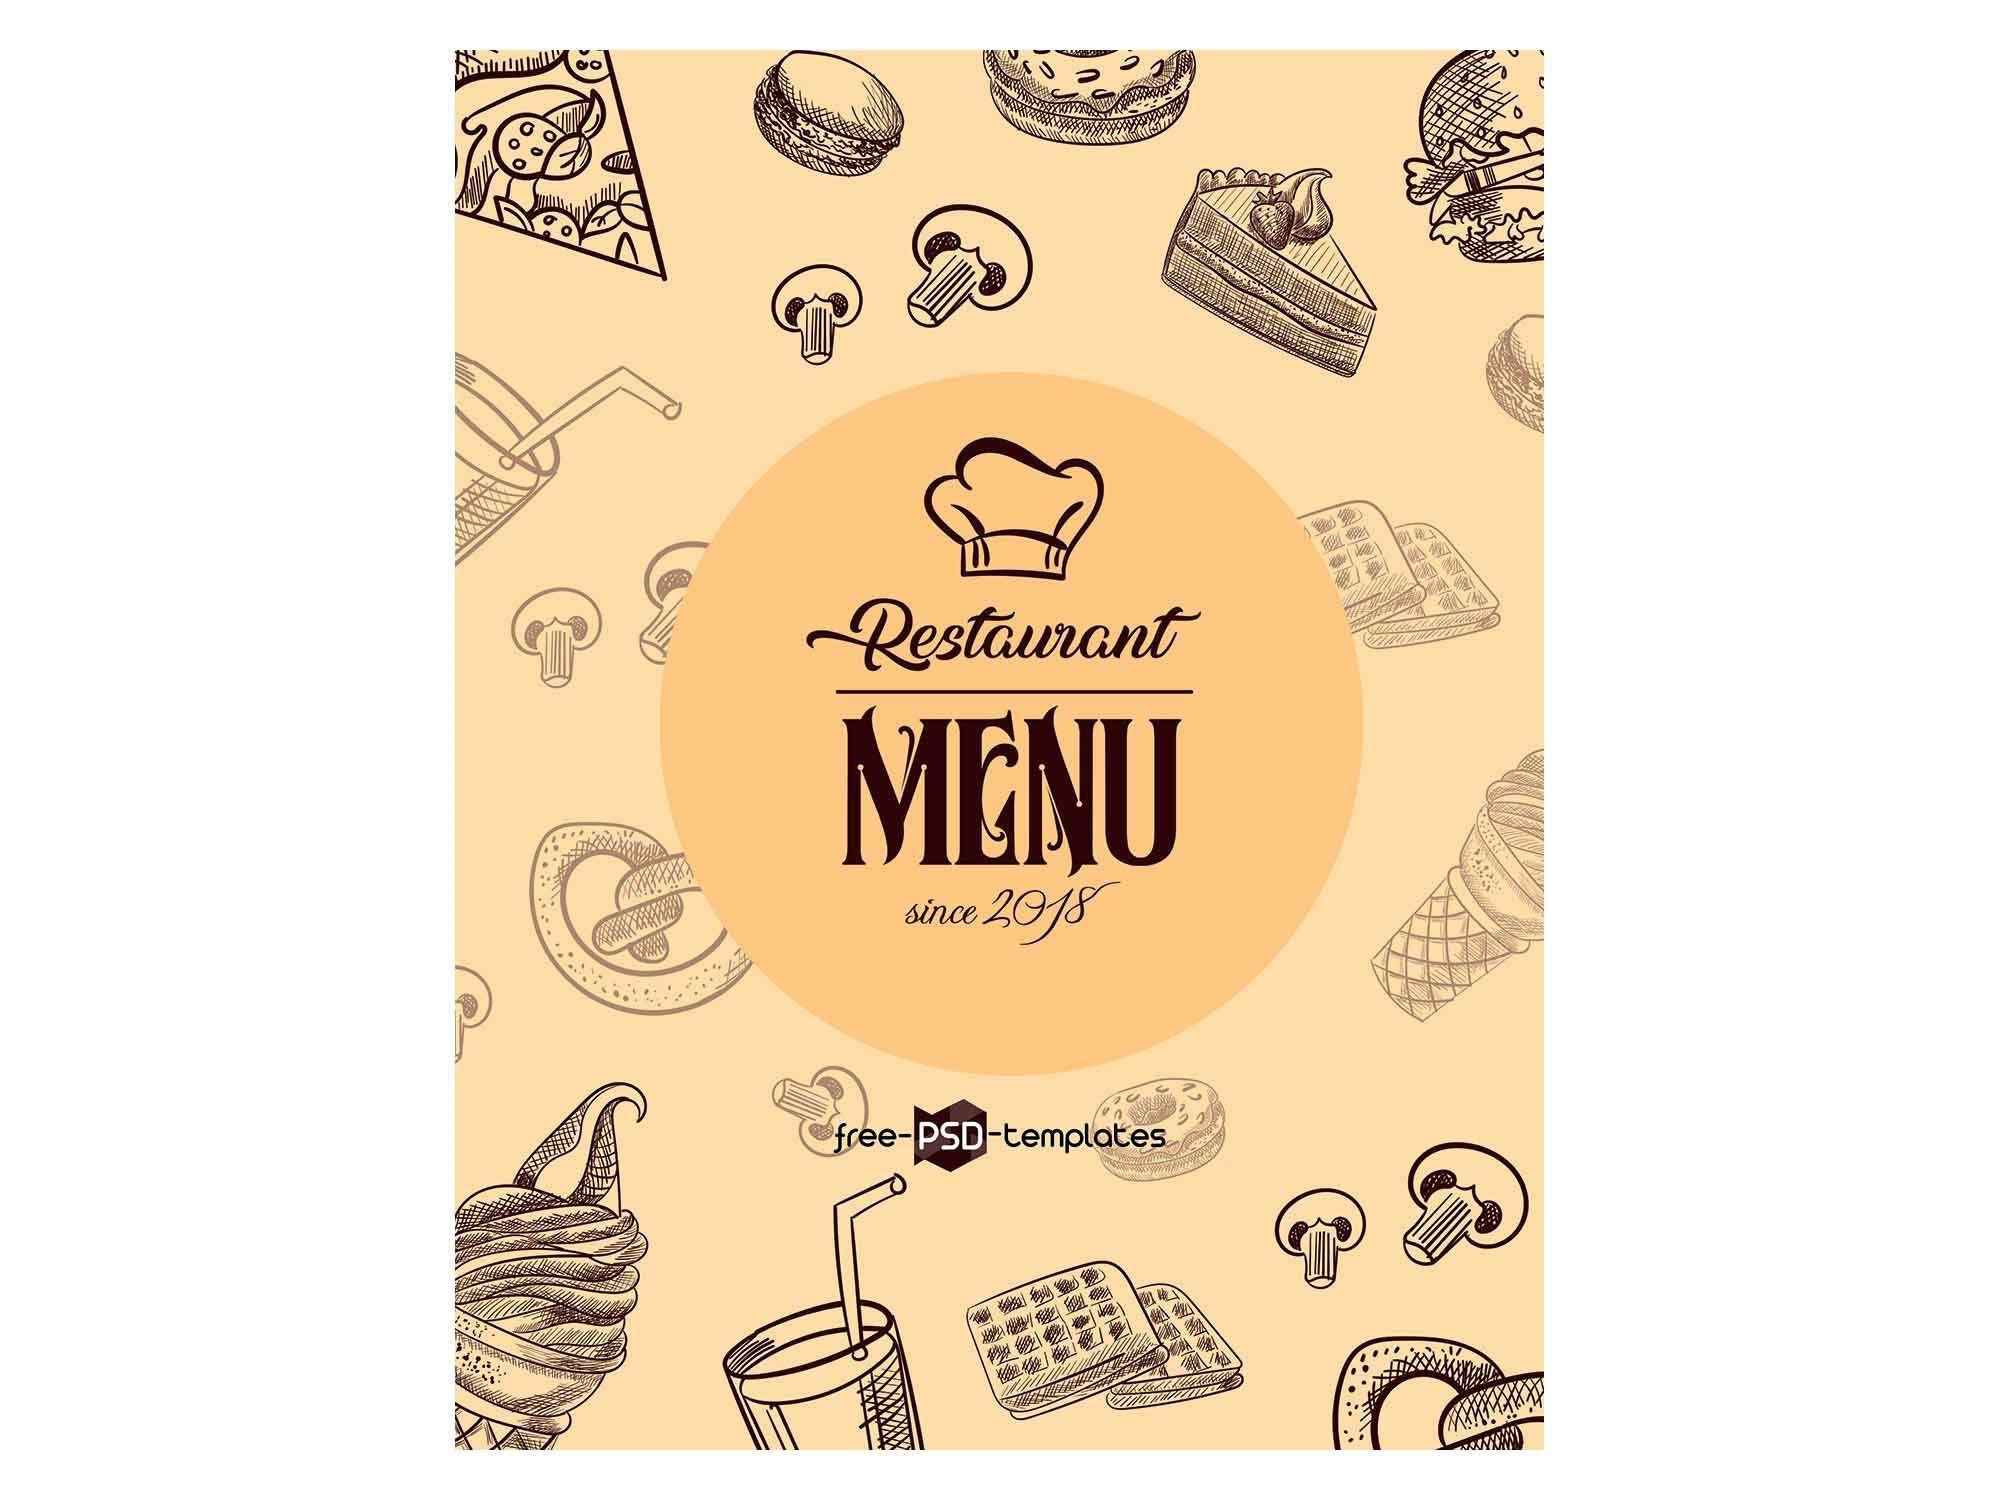 007 Magnificent Restaurant Menu Template Free Download Psd Highest Clarity  DesignFull